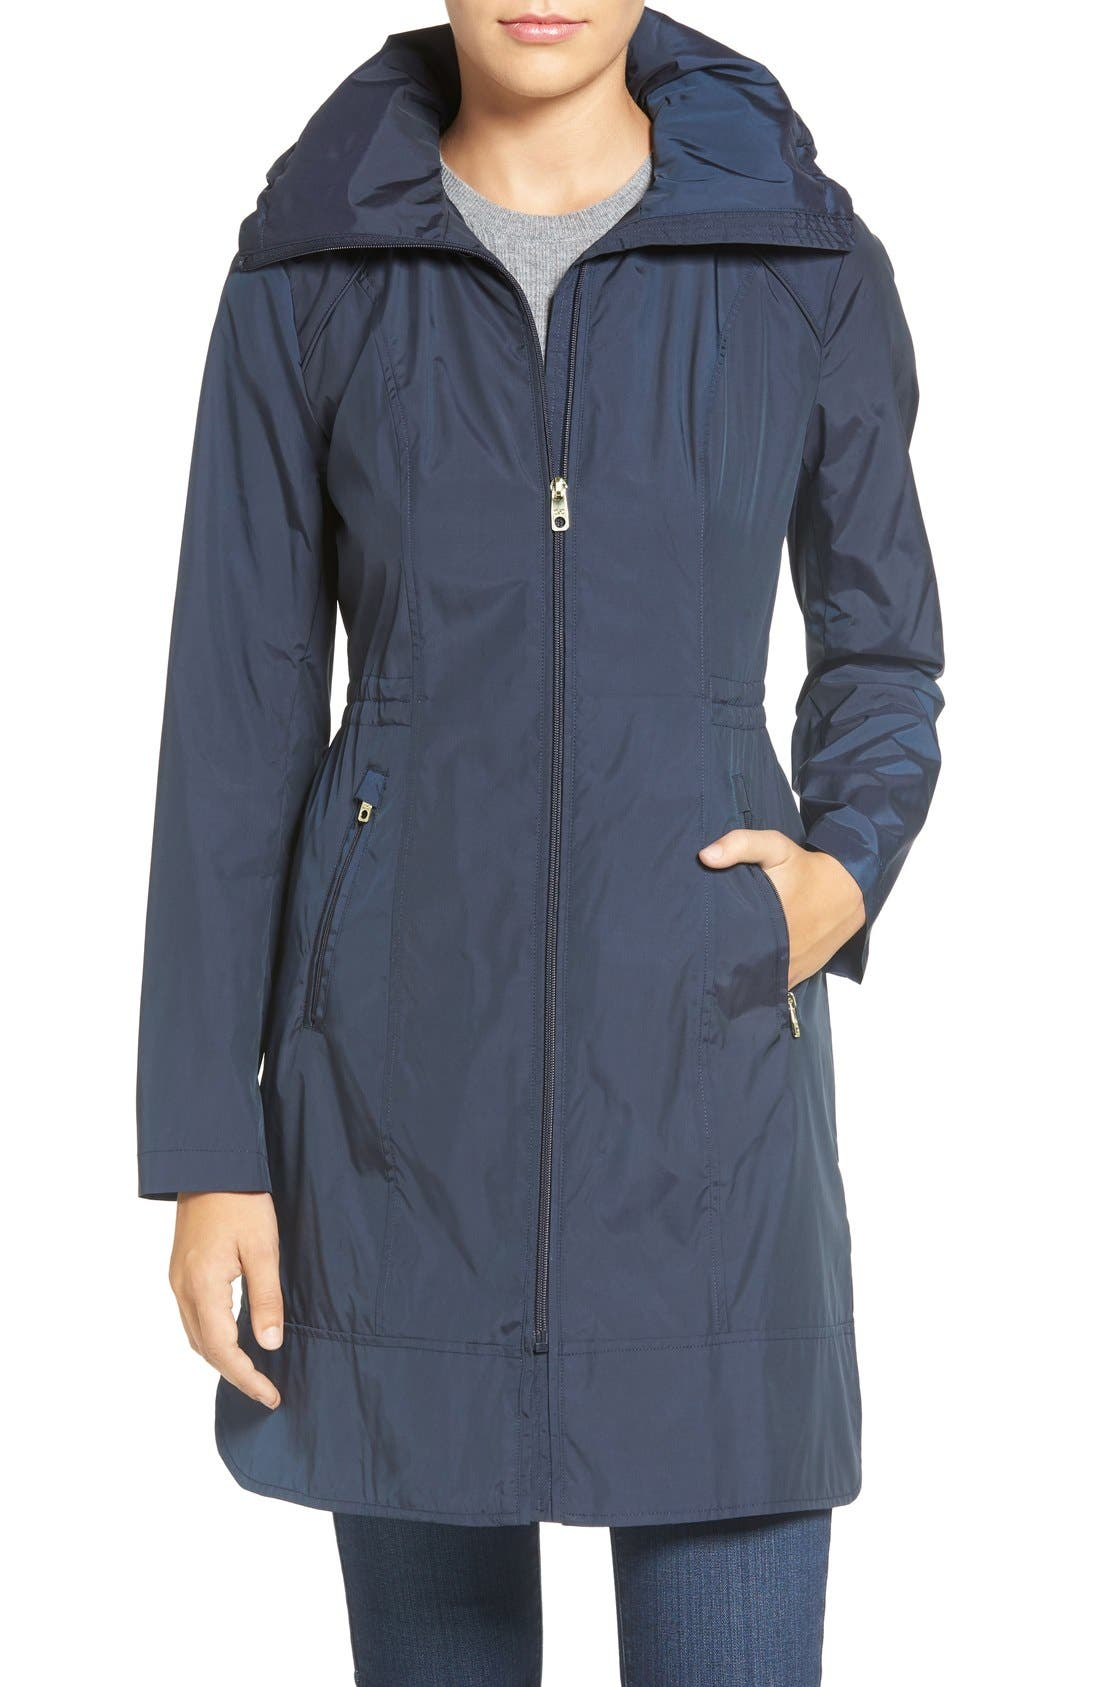 Packable Rain Jacket,                             Main thumbnail 1, color,                             Indigo